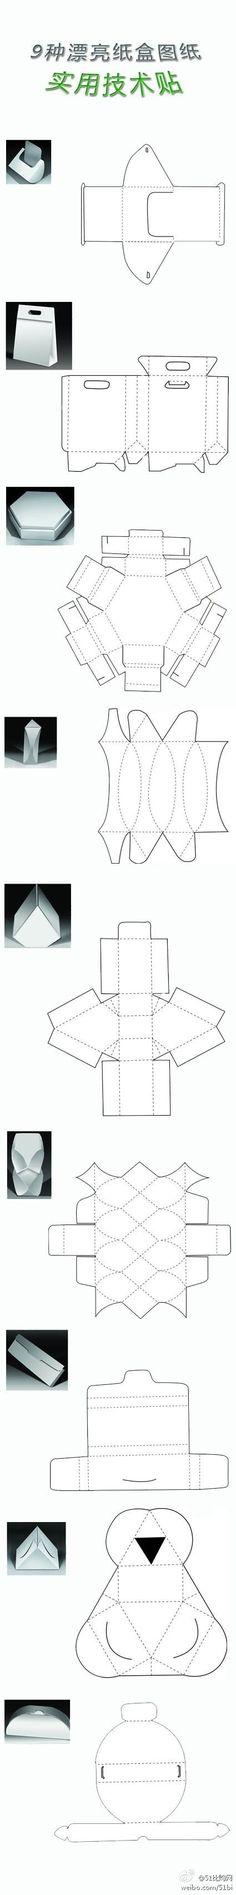 Origami Bag Diy Box Templates 21 Ideas For 2019 Diy Gift Box, Diy Box, Diy Gifts, Gift Boxes, Origami Paper, Diy Paper, Paper Crafts, Origami Bag, Diy Origami